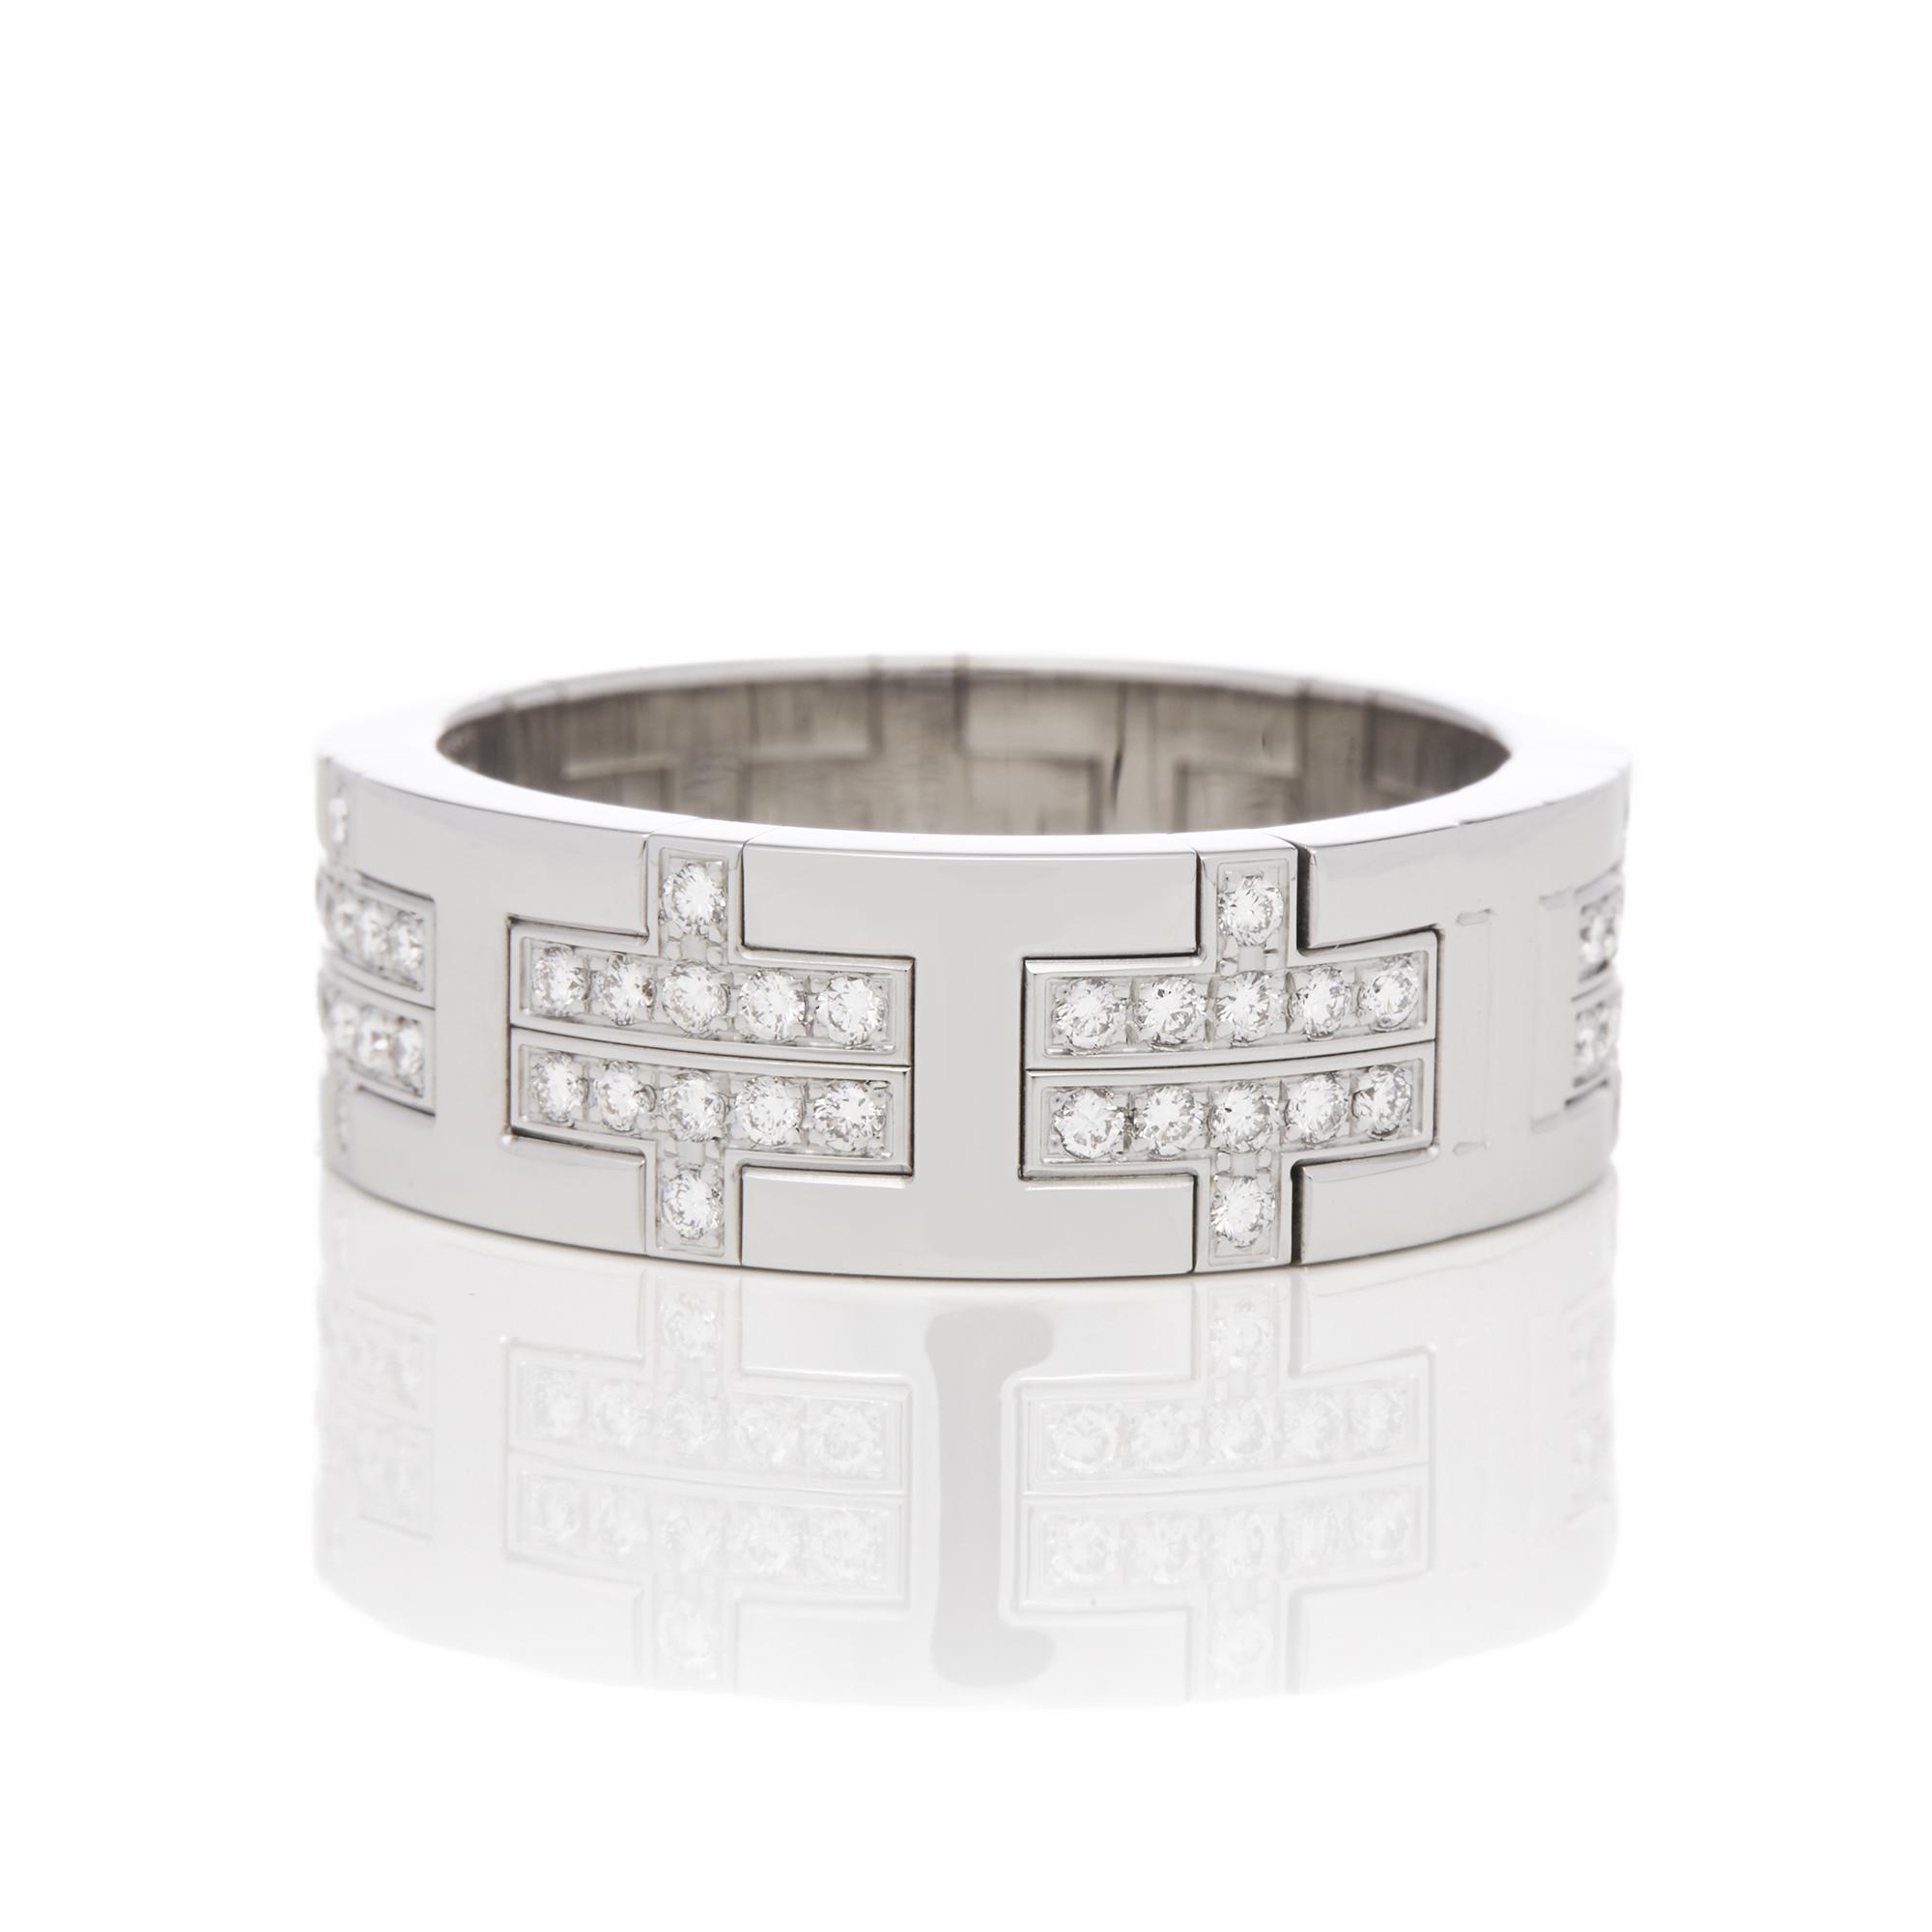 Hermes 18ct White Gold Kilim Diamond Ring - Image 7 of 8